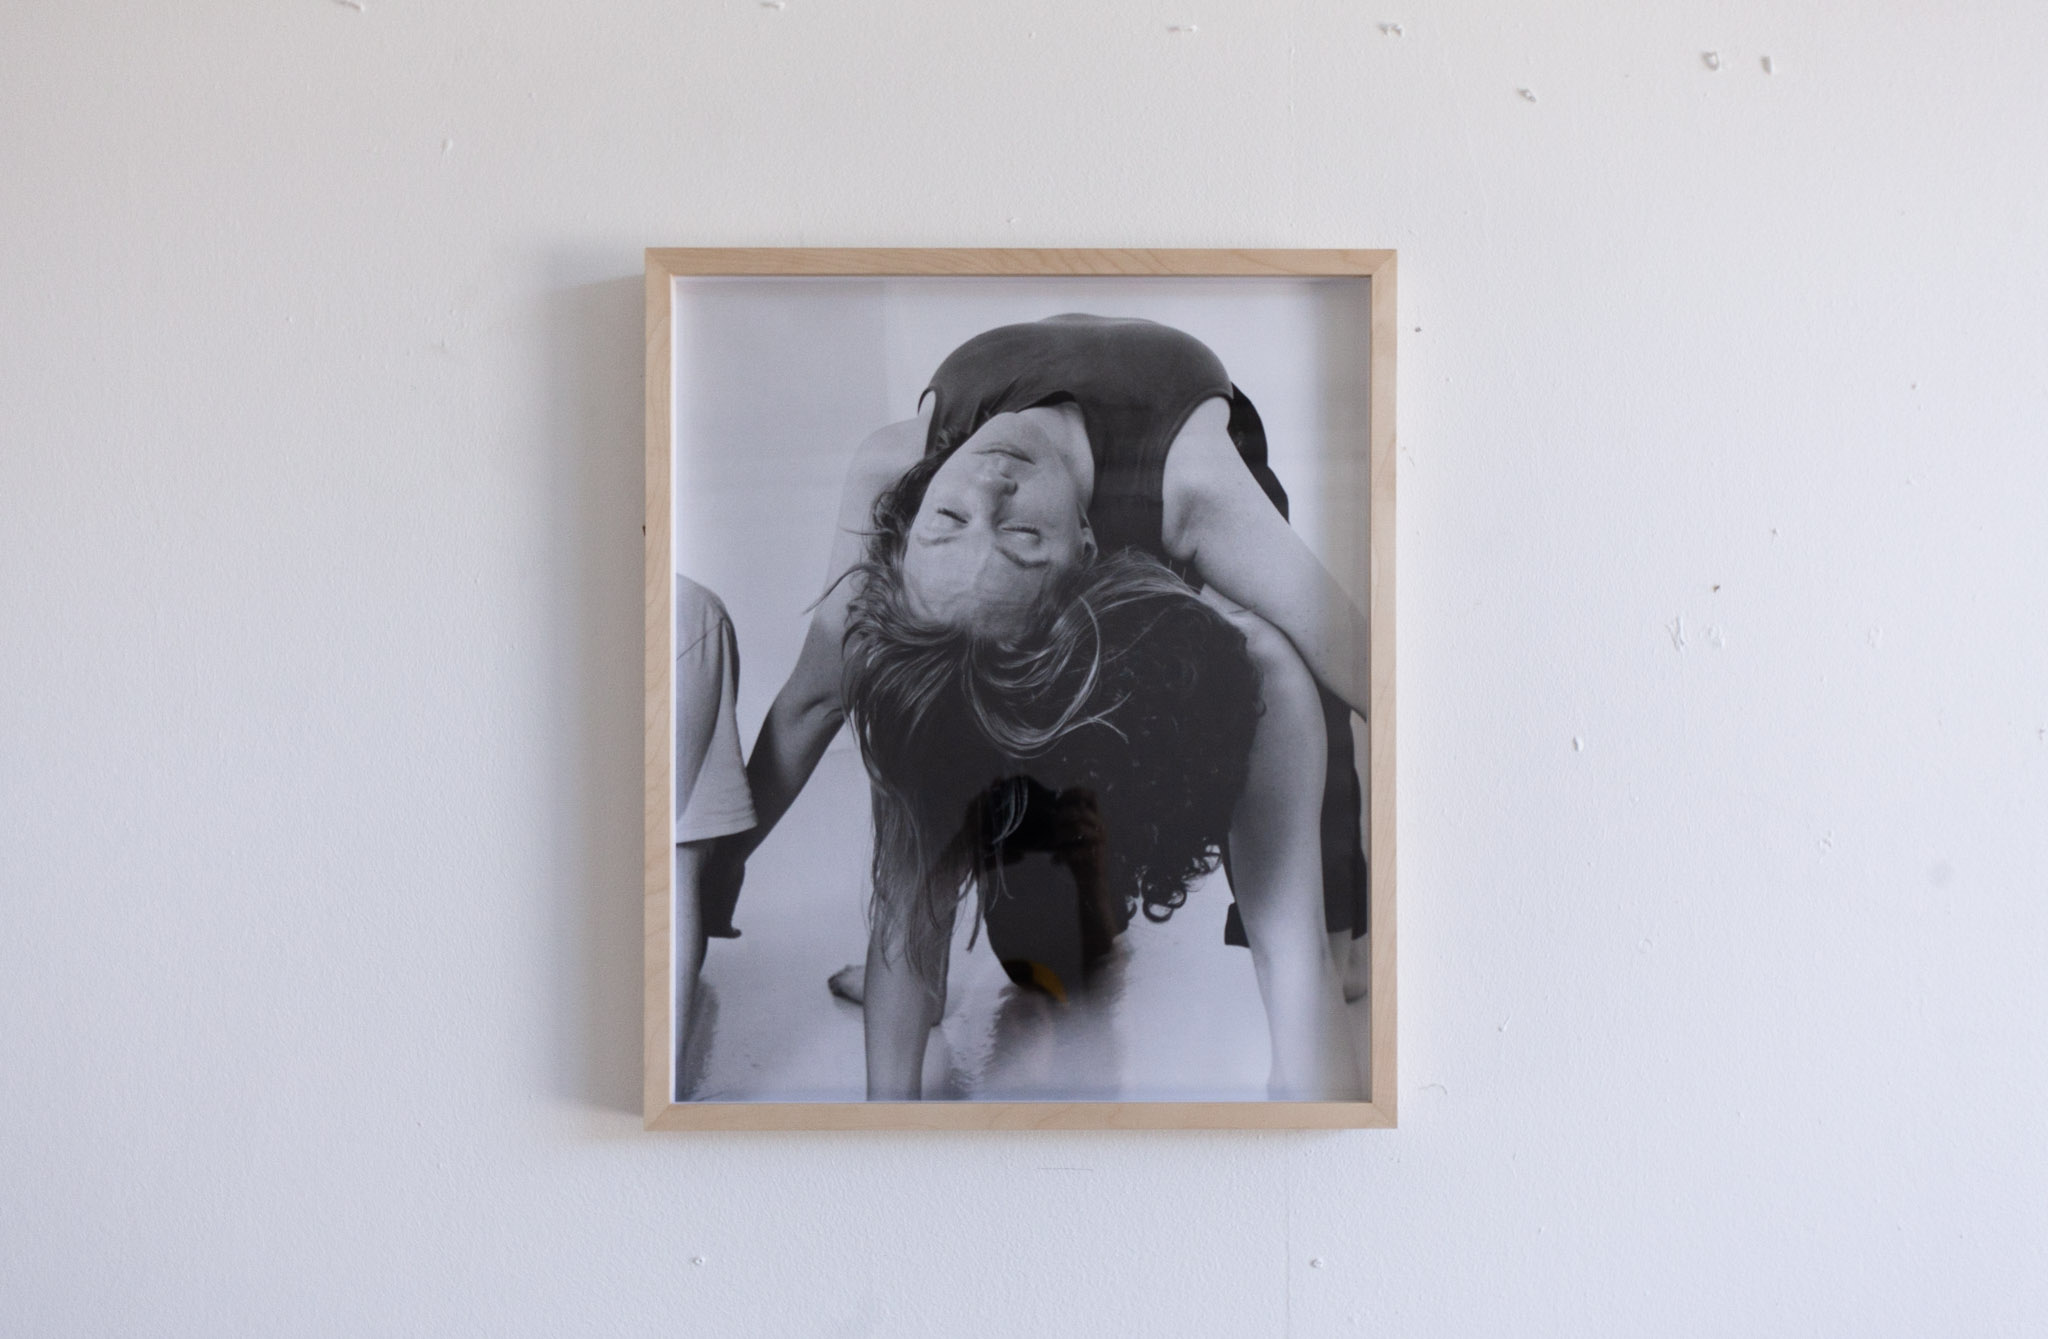 Jenna Westra, installation view.